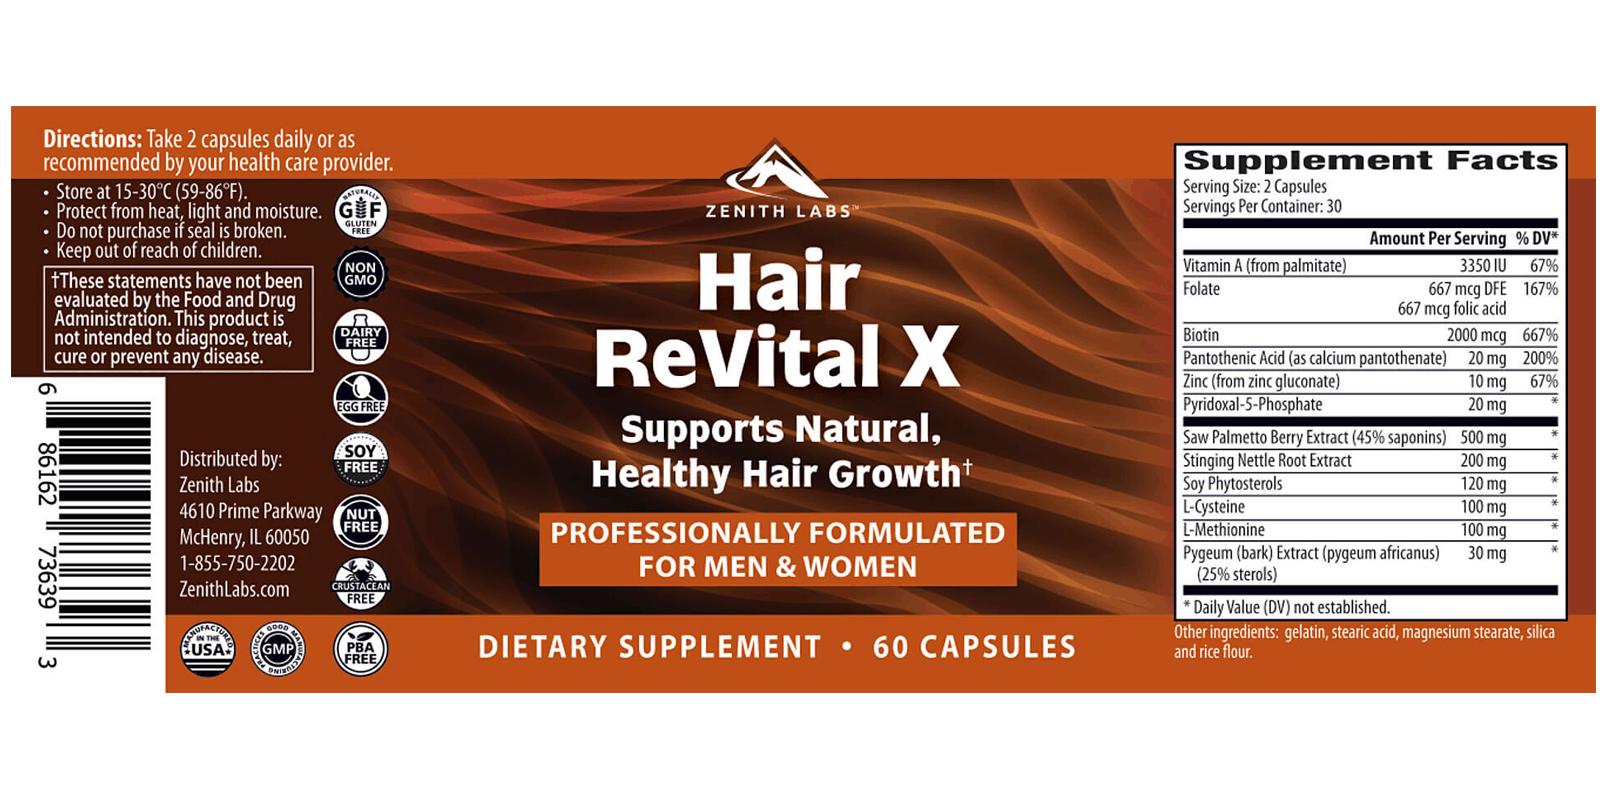 Hair Revital X dosage